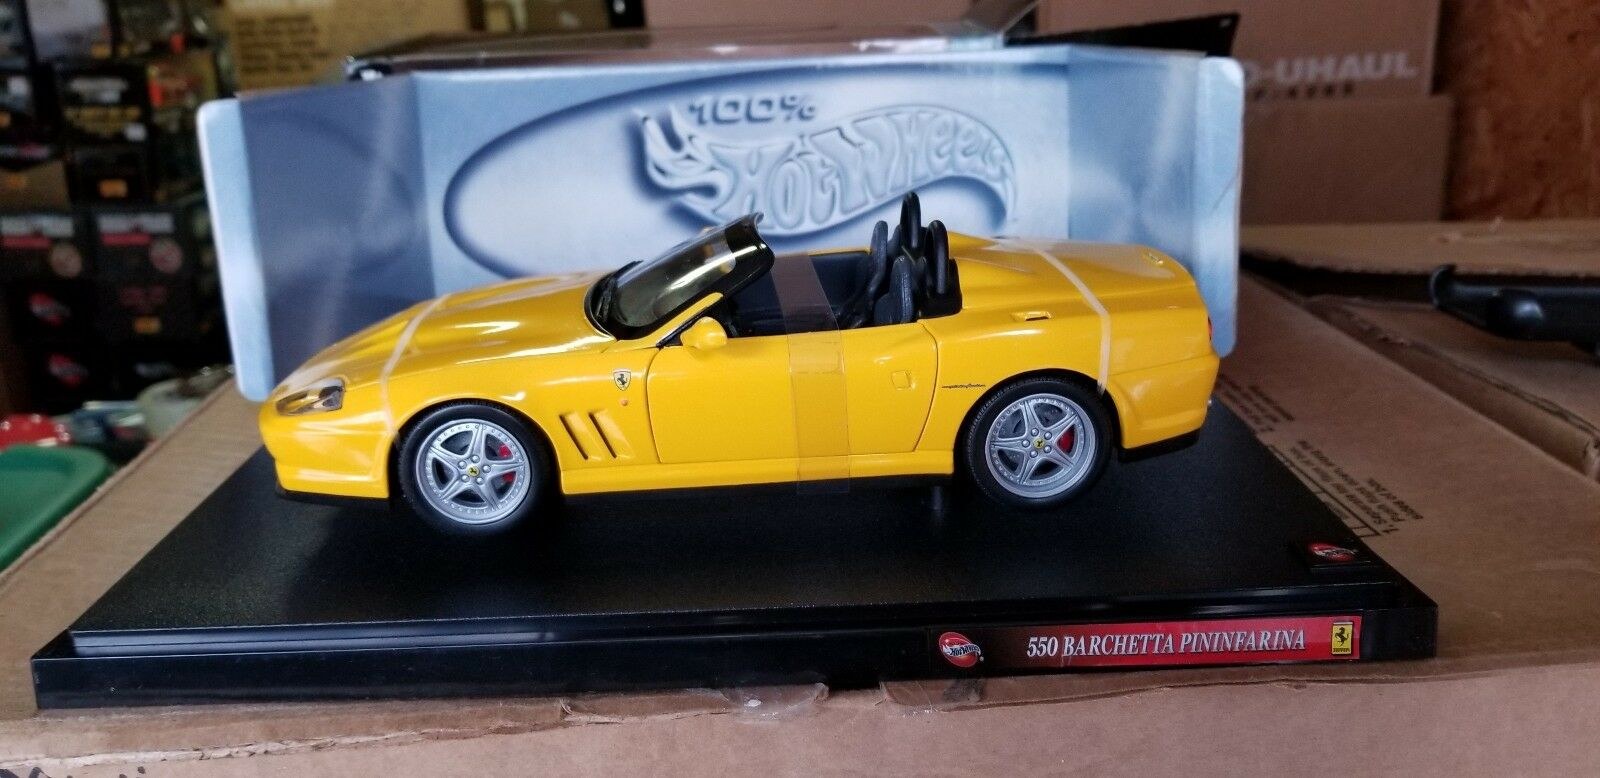 1 18 Hot Wheels Ferrari Barchetta Pininfarina Yellow